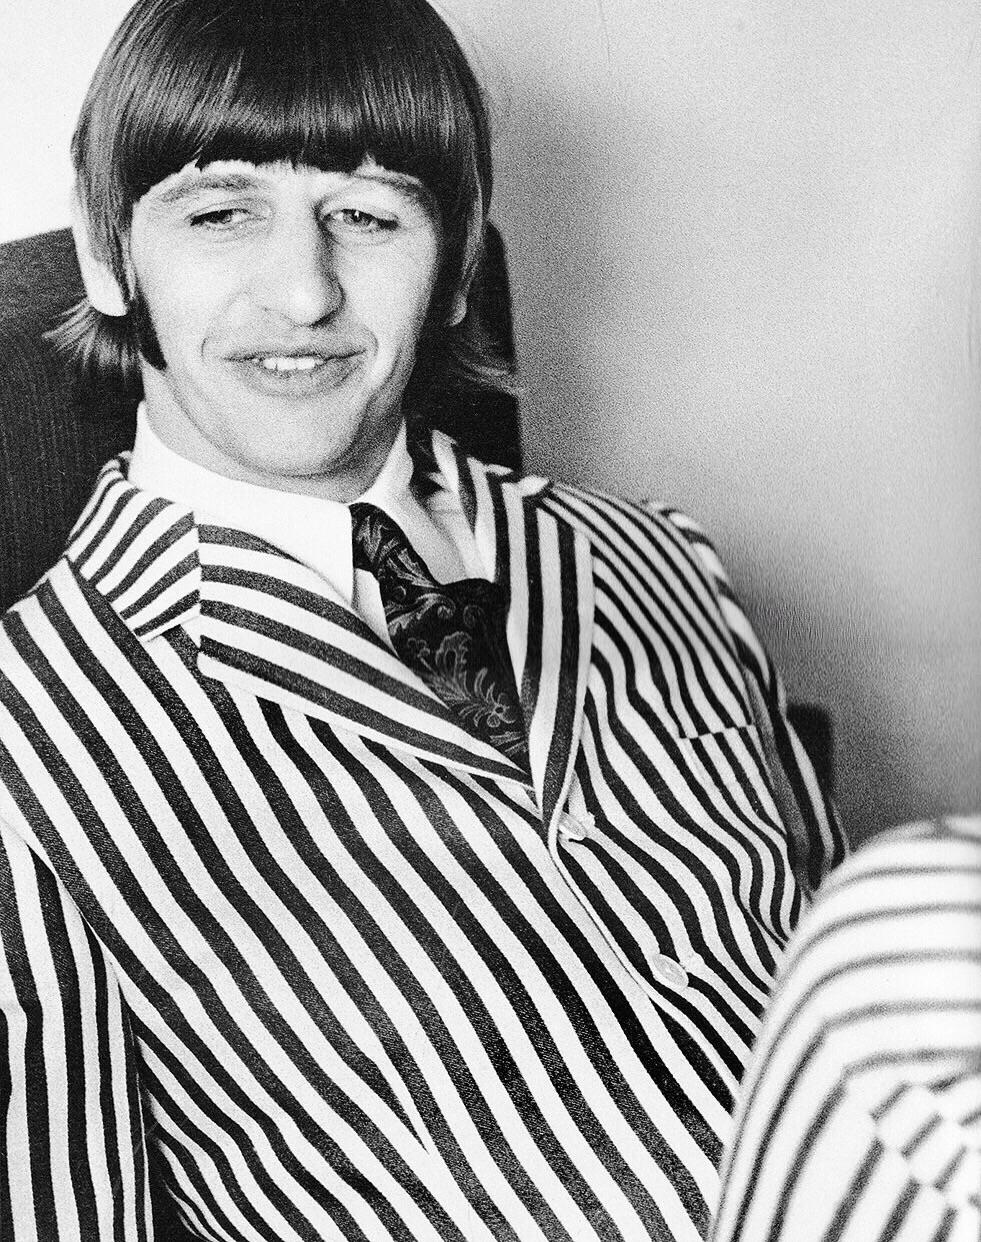 Ringo Starr 1966.